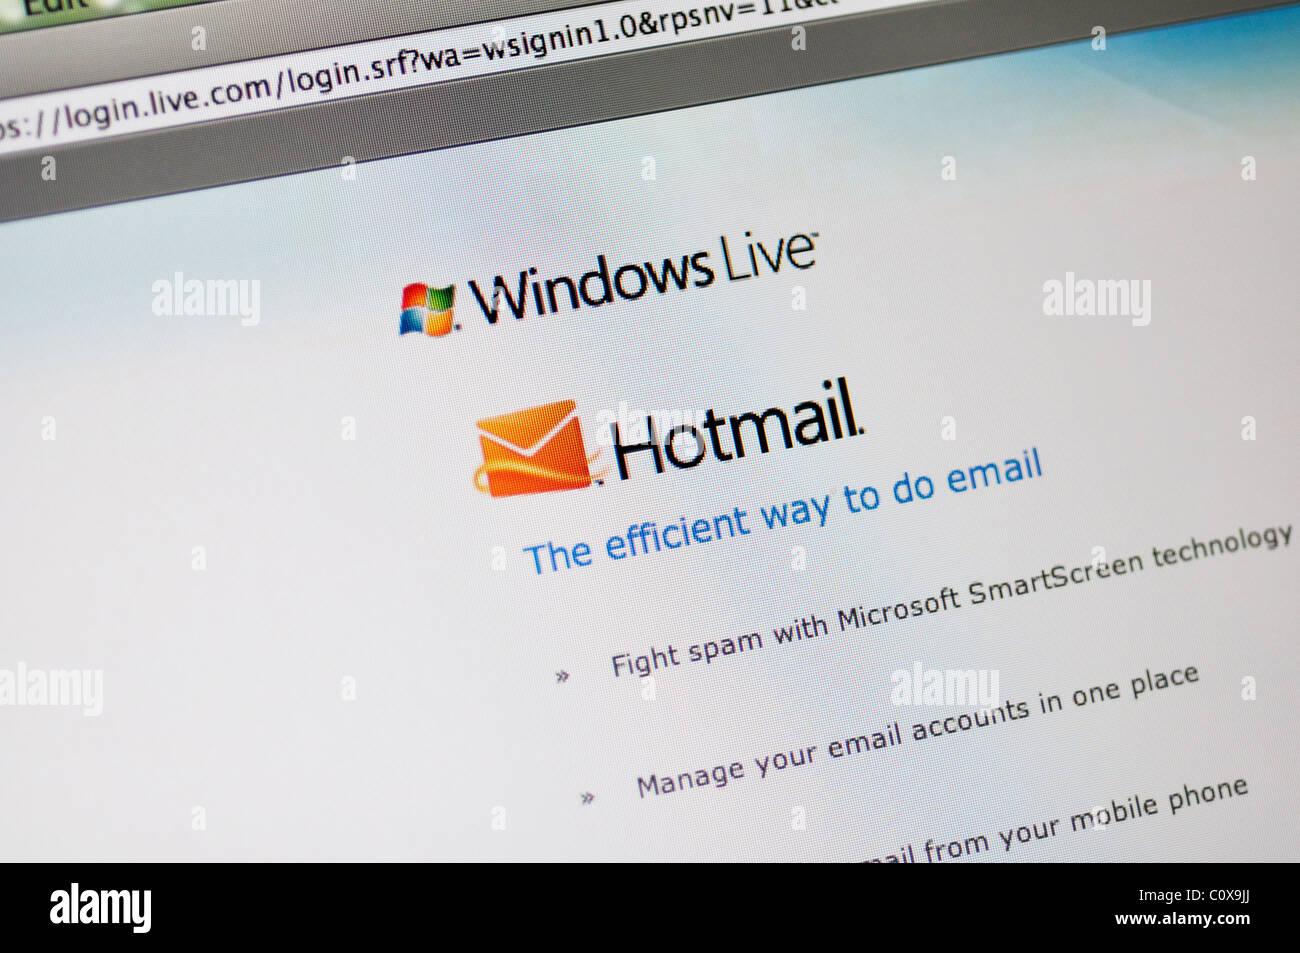 Hotmail website - Stock Image